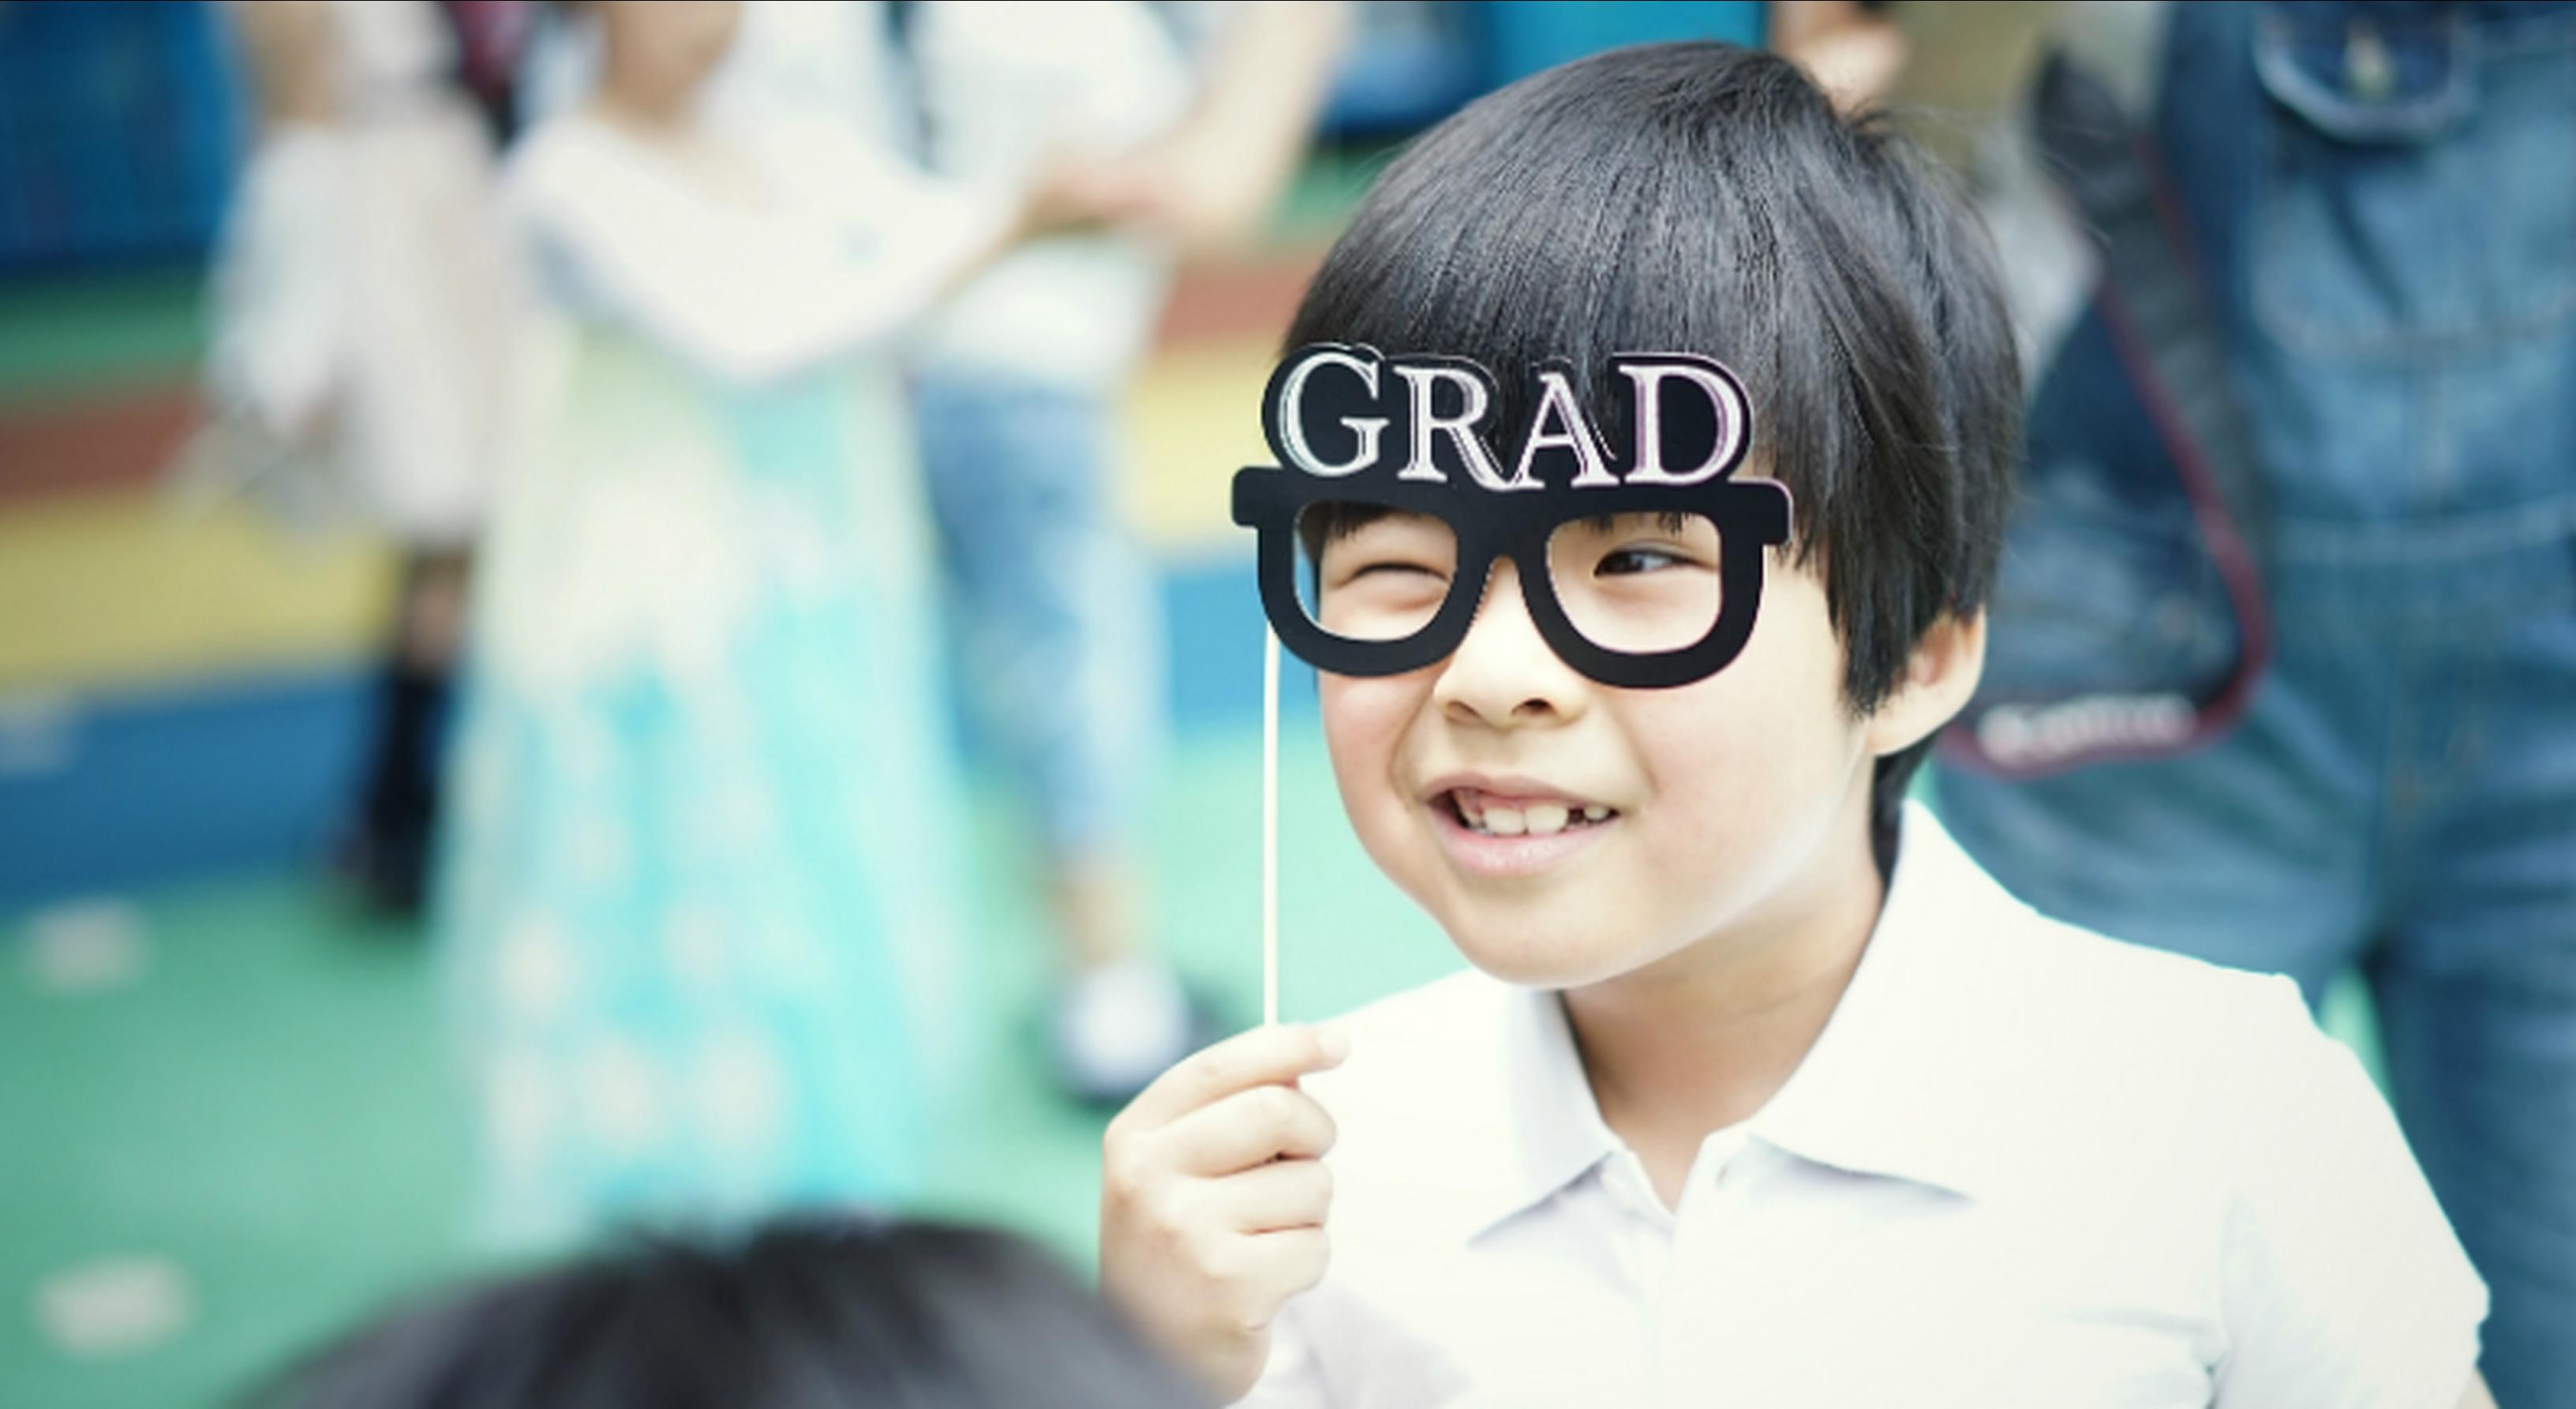 Child wearing joke graduation glasses